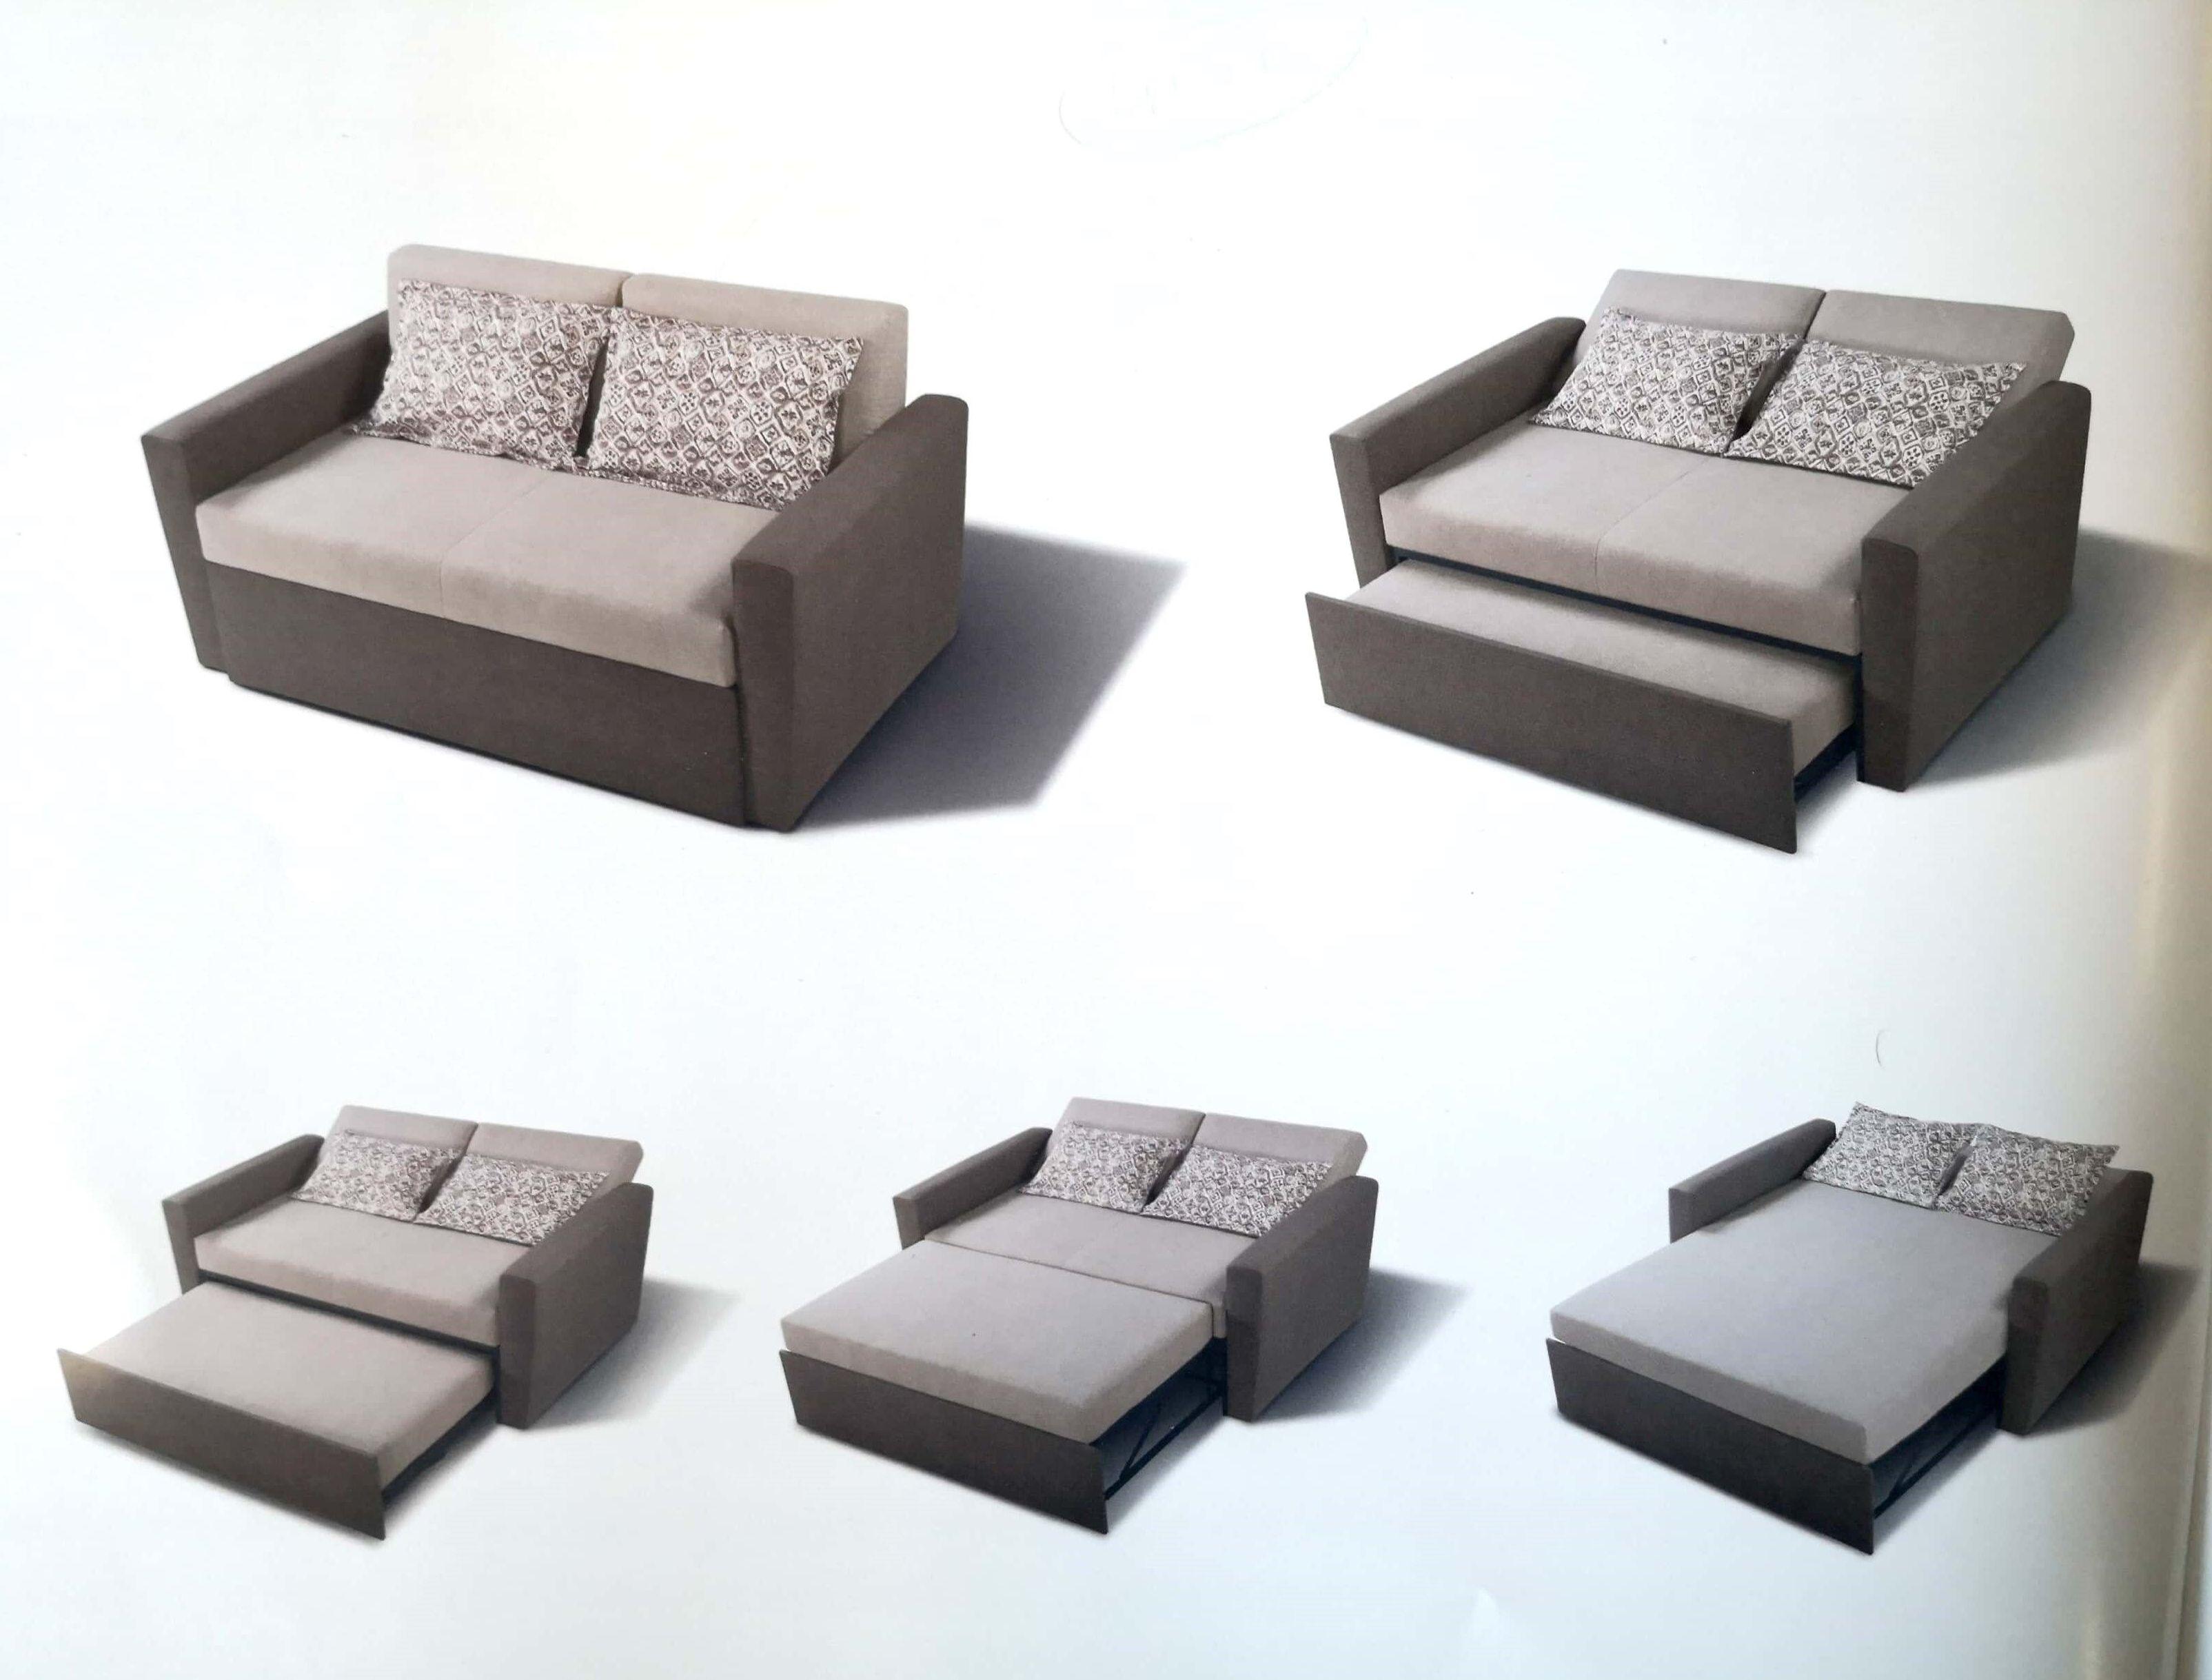 Sofa Cama Kika Ancho 162cm Desde 550€